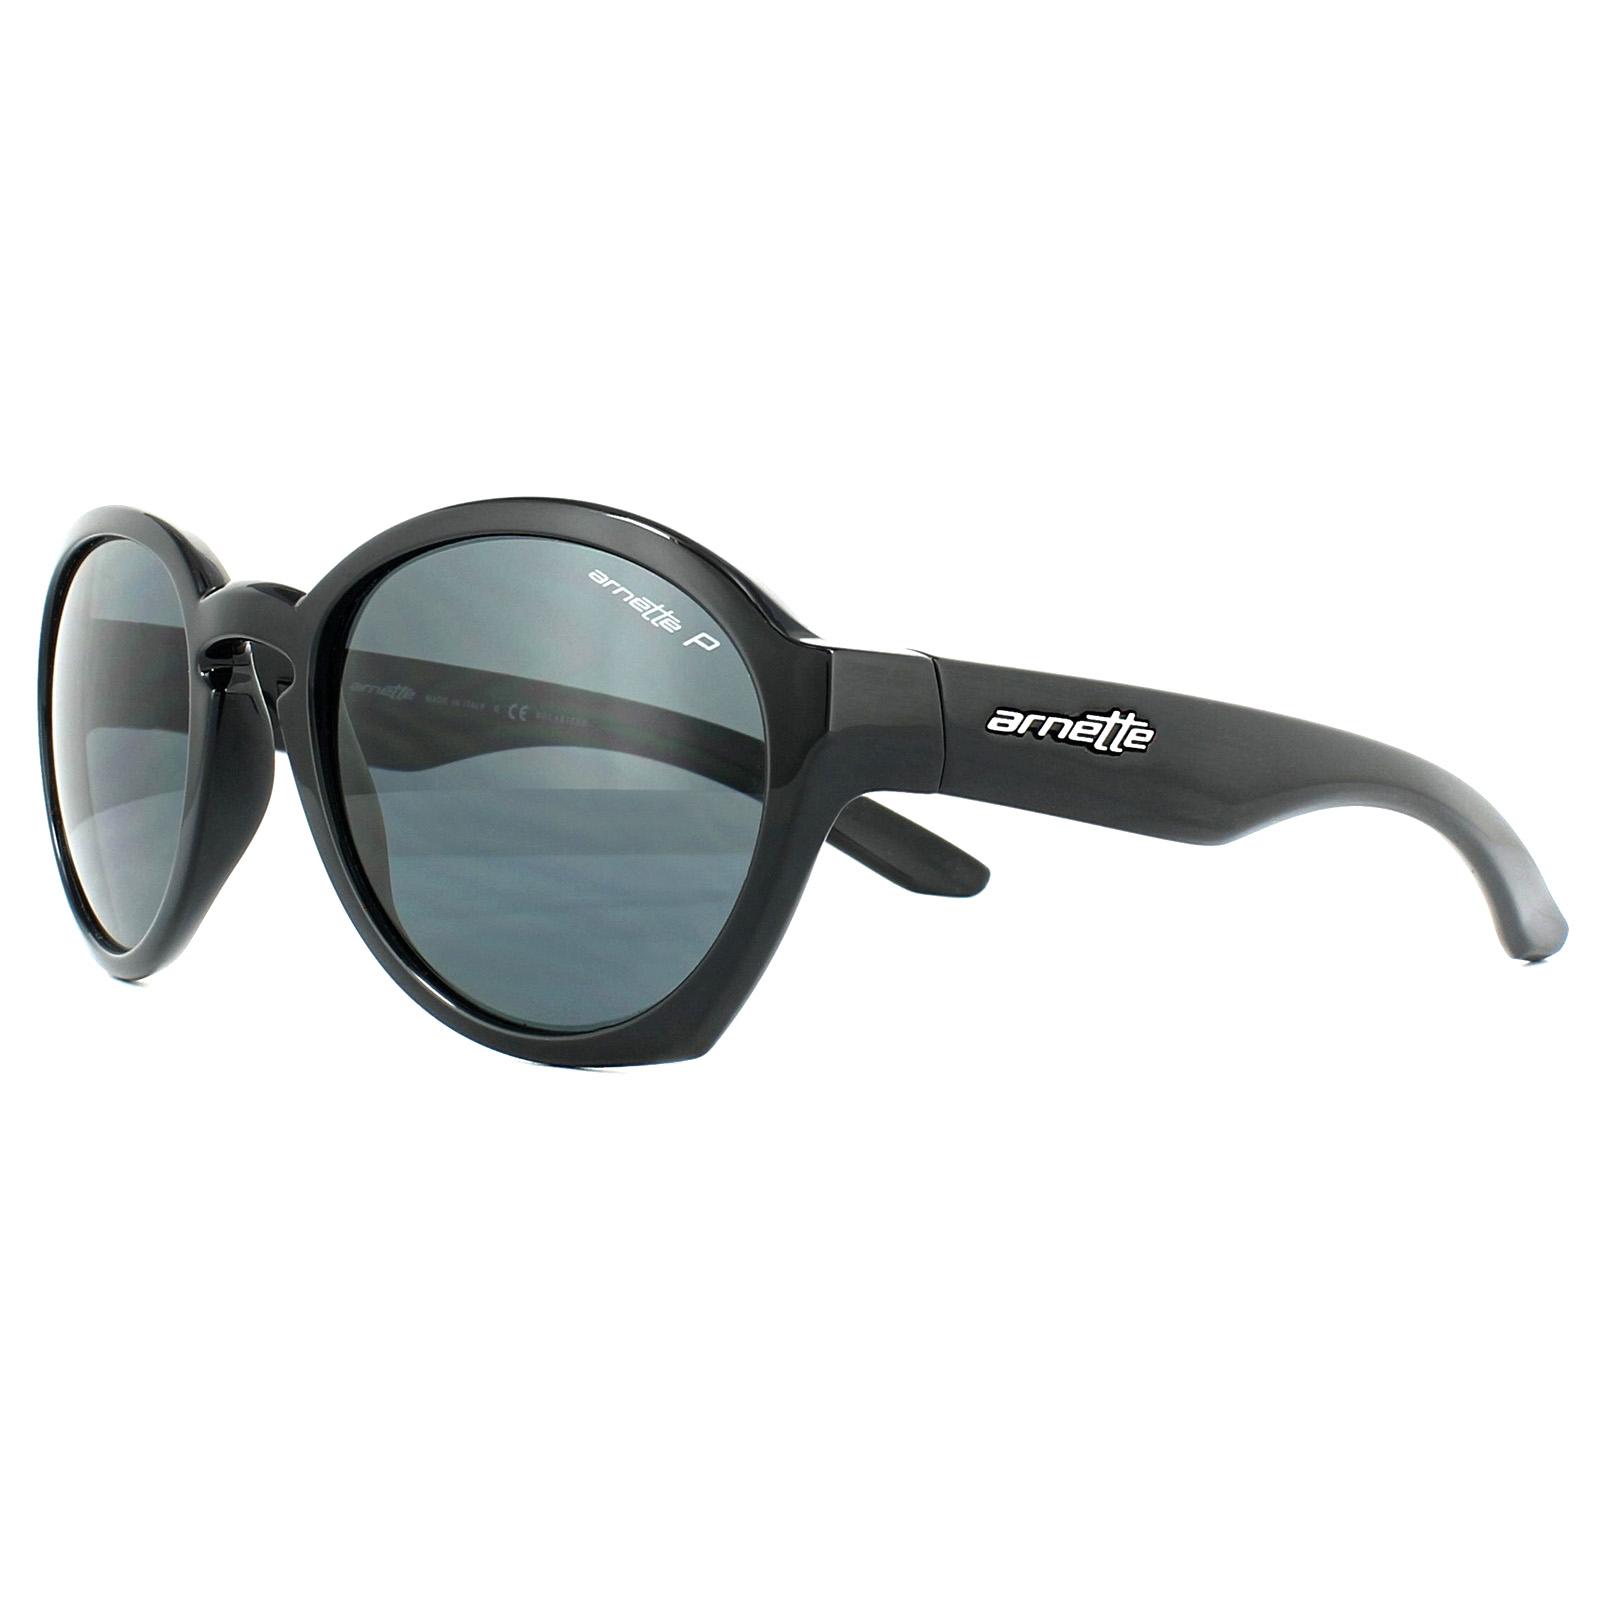 9cabf5f133f1d Sentinel Arnette Sunglasses Moolah 4170 41 81 Black Grey Polarized